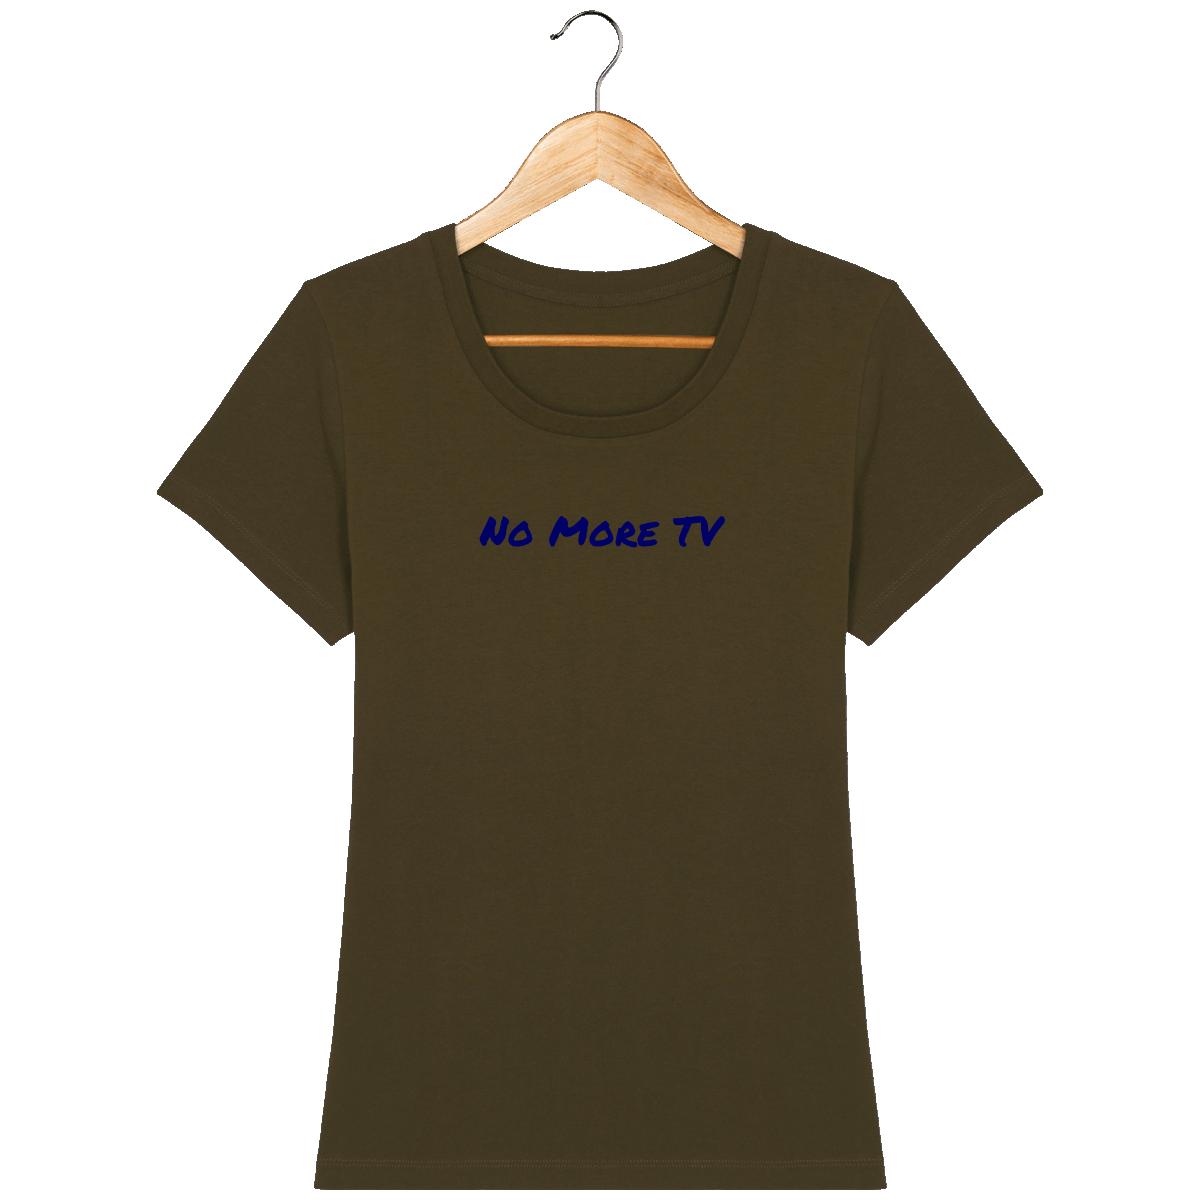 tee-shirt-bio-brode-no-more-tv-white-navy_british-khaki_face